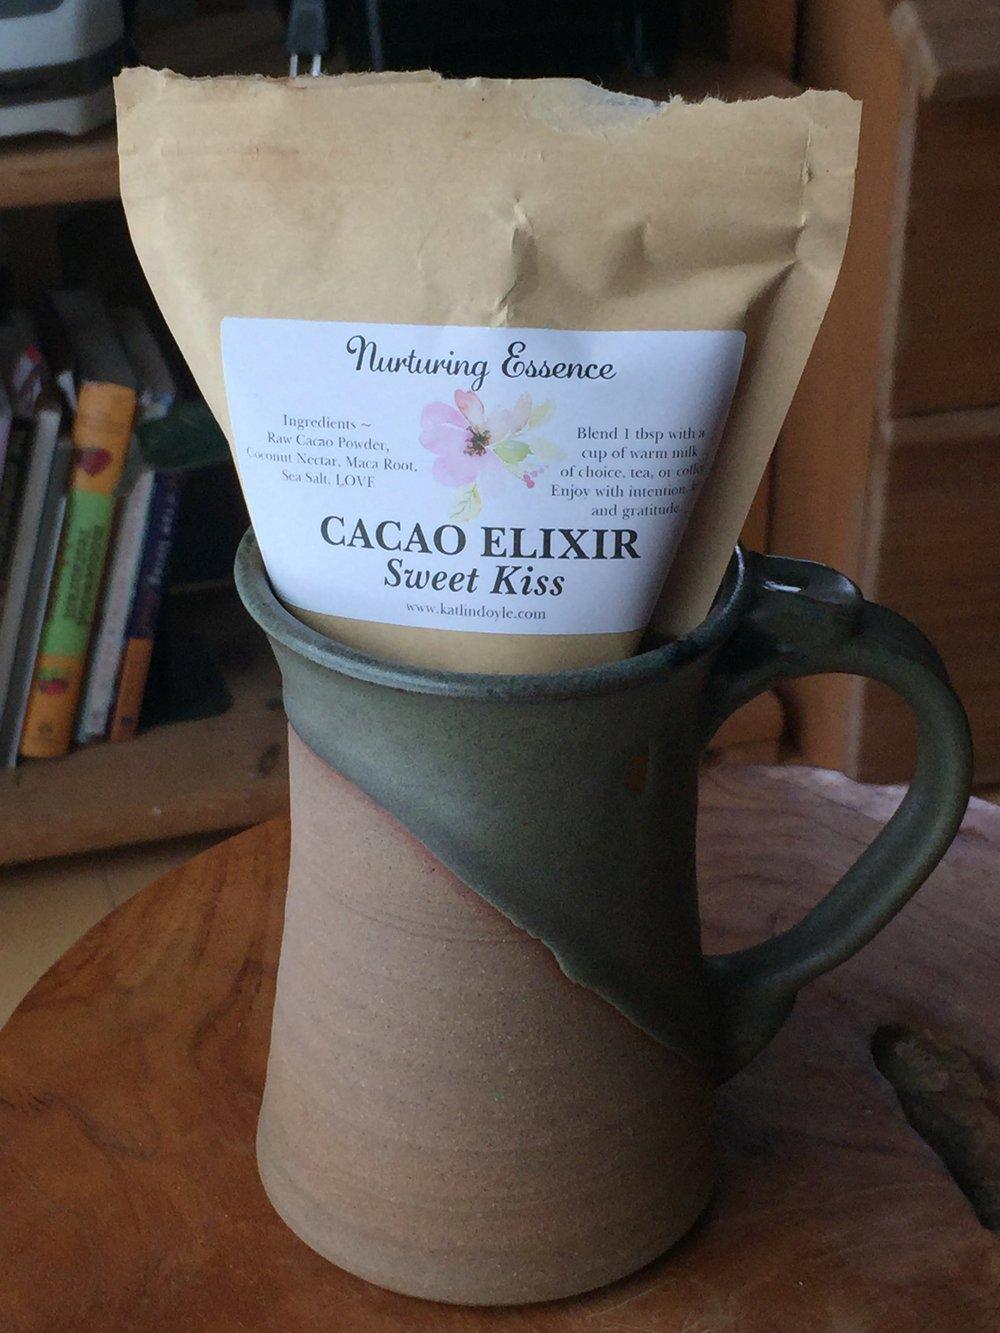 Sooooo goood Cacao Elixer (and delectable treats) by Katlin Doyle of Nurturing Essence